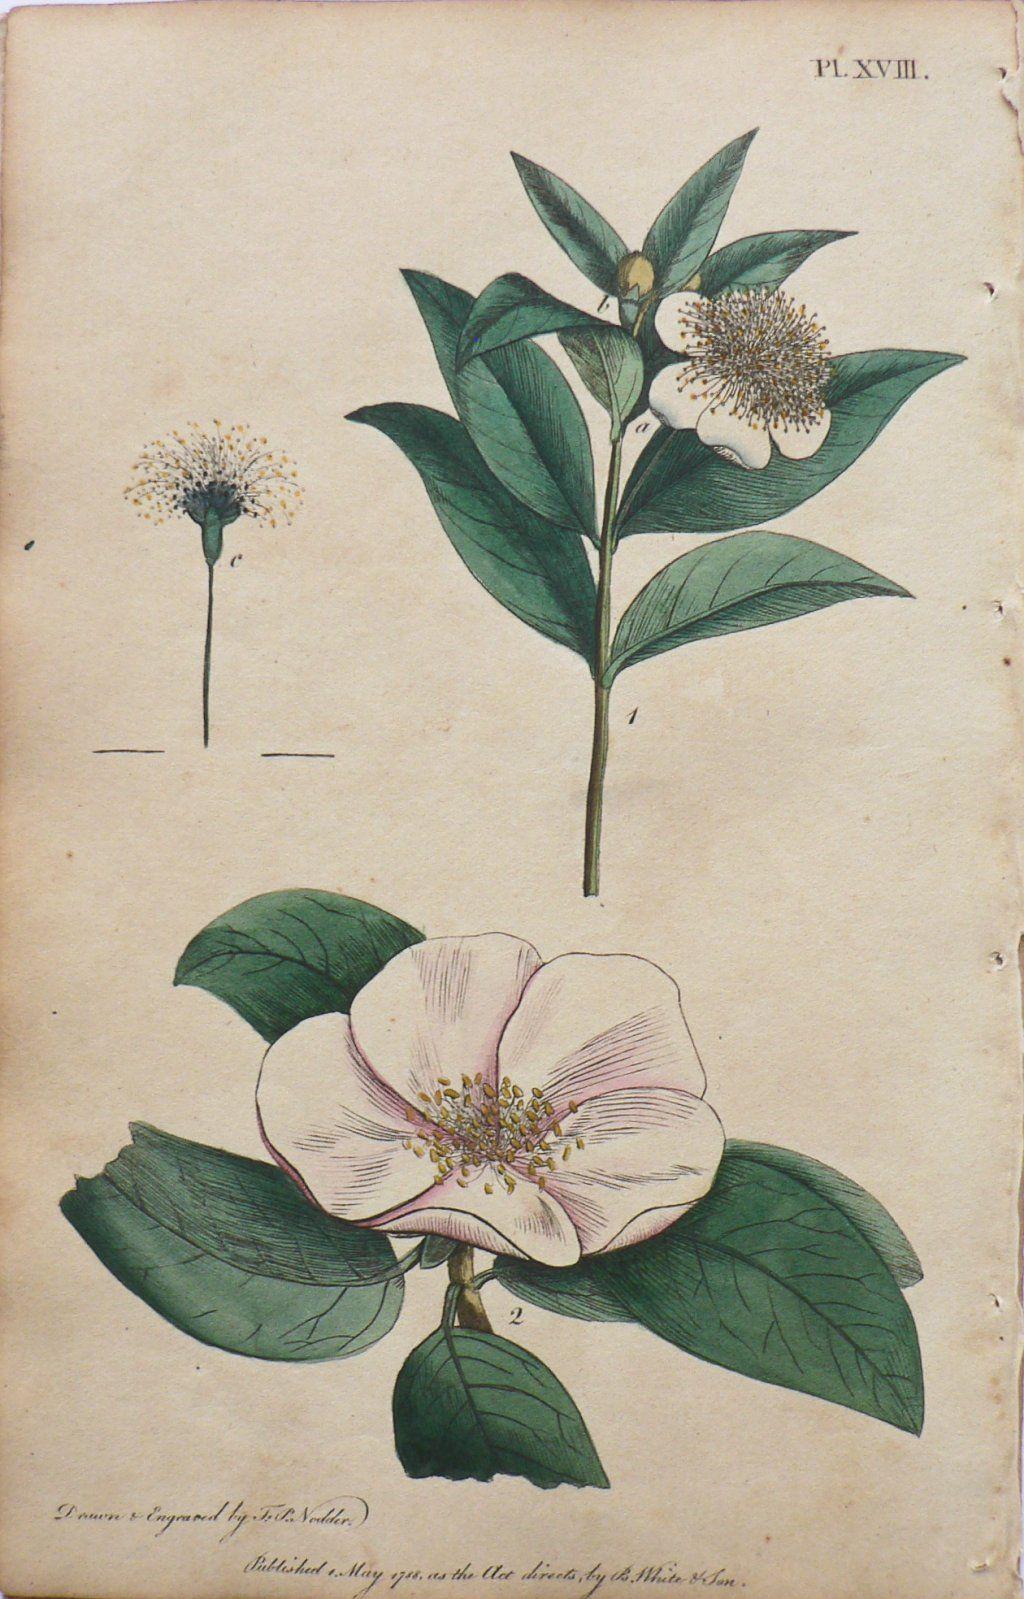 Thomas Martyn Myrtle Quince System Of Vegetables London J White 1799 Plate Xviii Icosandria M Botanical Illustration Illustration Biodiversity